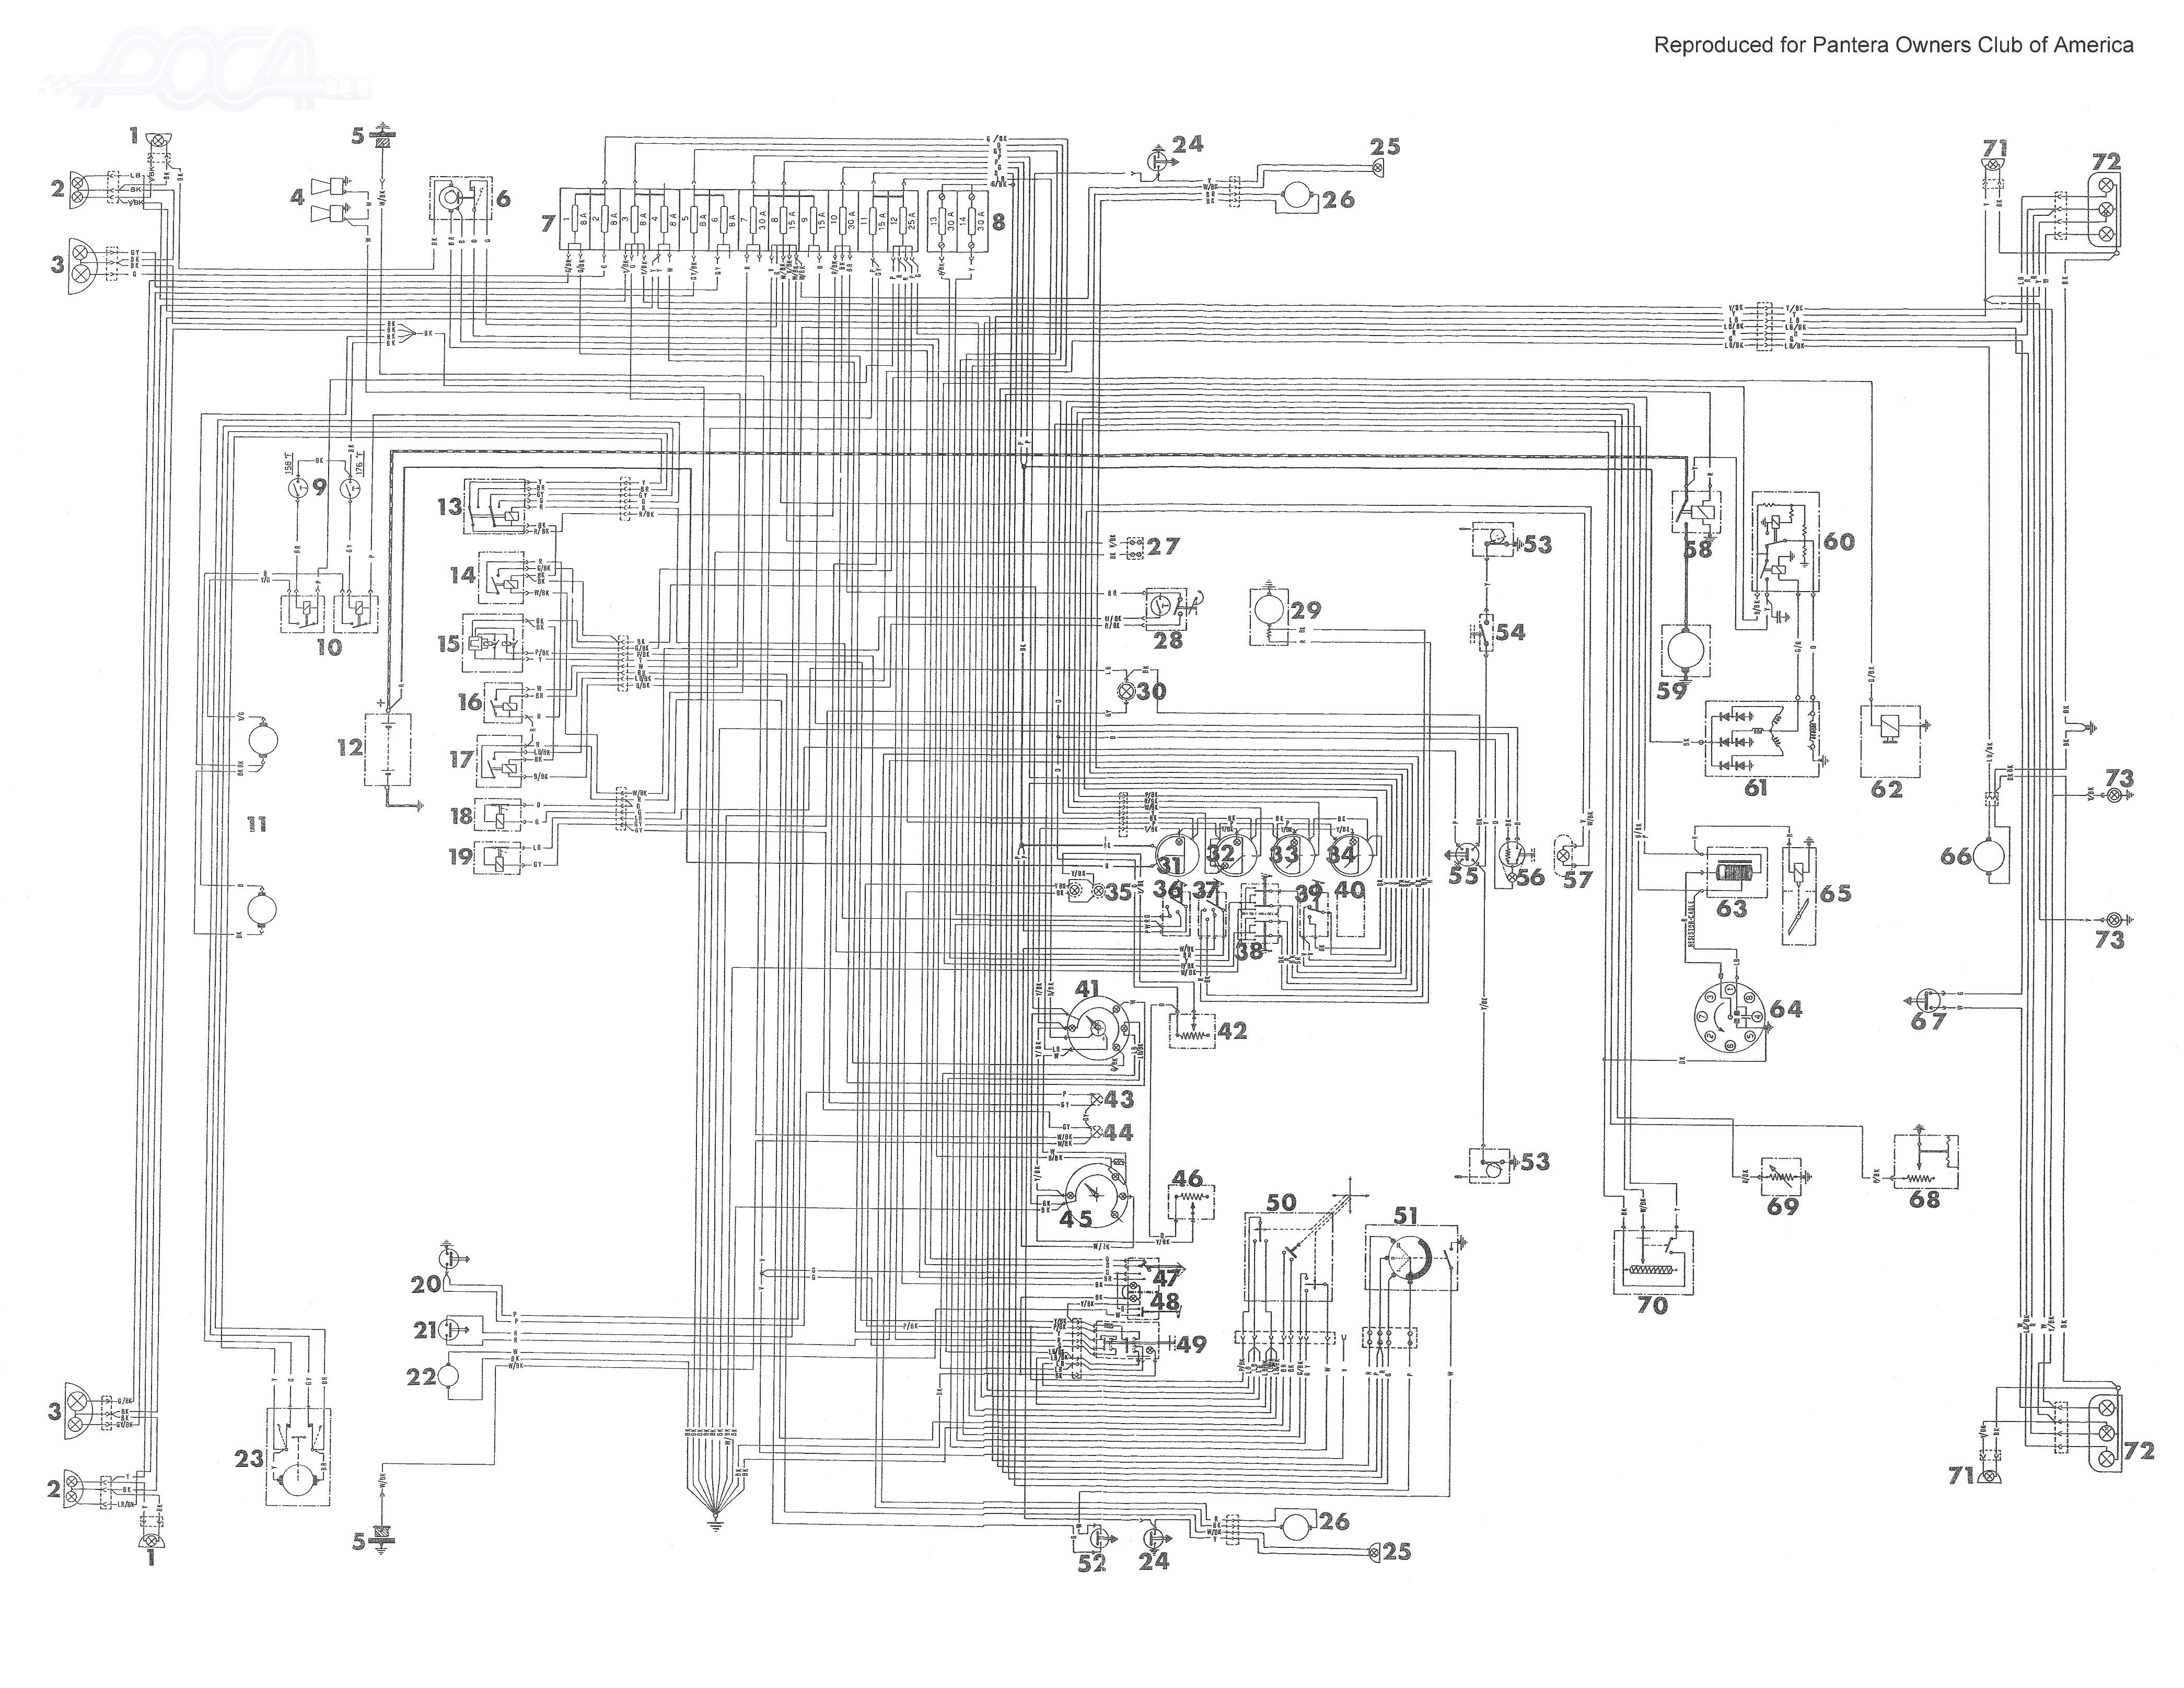 De+Tomaso+L+Schematic+Wiring+Diagram?t=1508404309 de tomaso car manuals, wiring diagrams pdf & fault codes kenworth wiring diagram for pto at bayanpartner.co